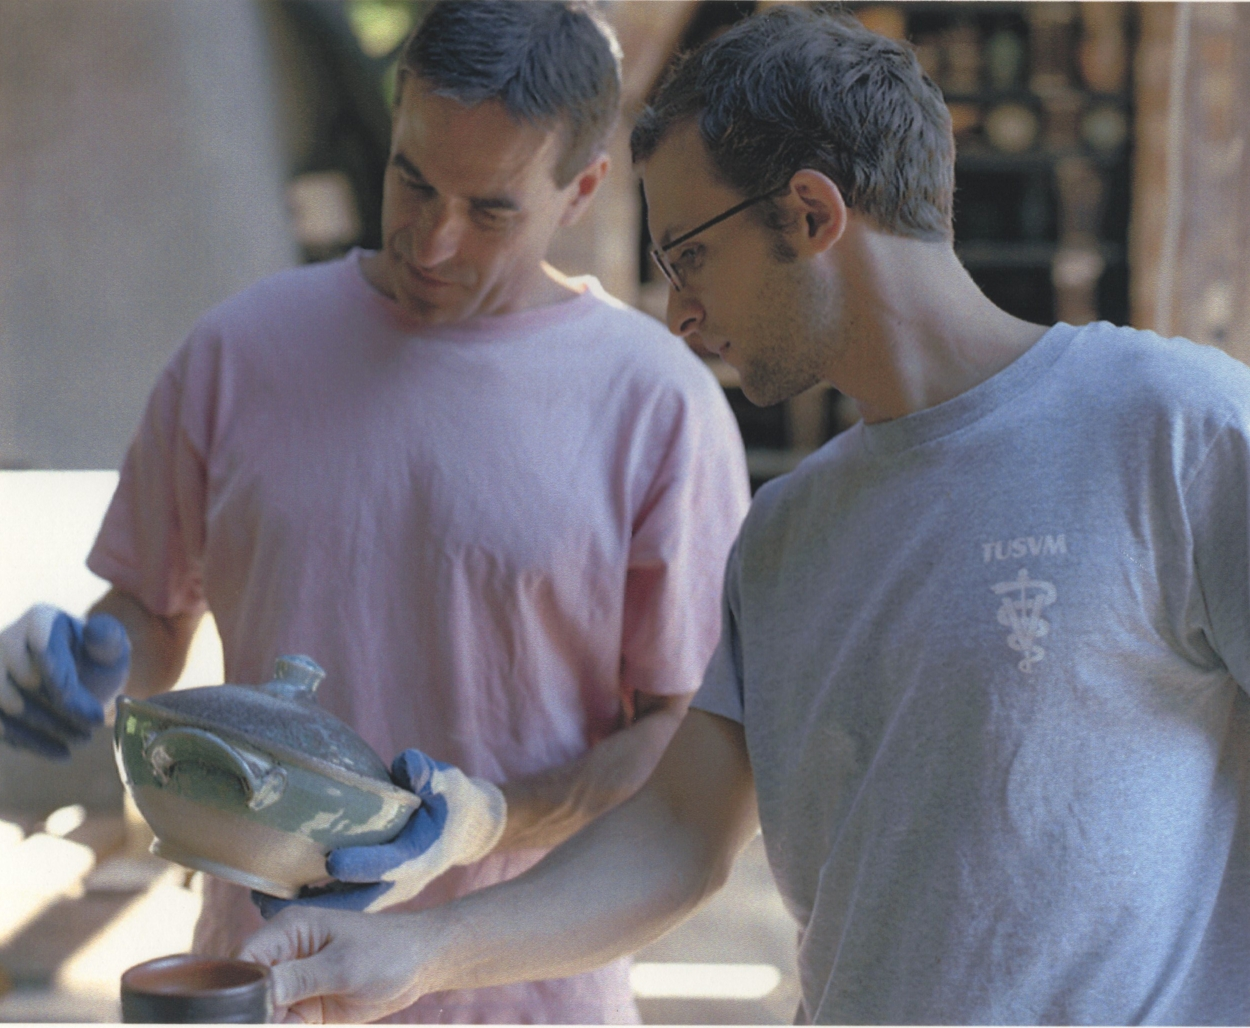 Mark Shapiro and Michael McCarthy at Stonepool Pottery